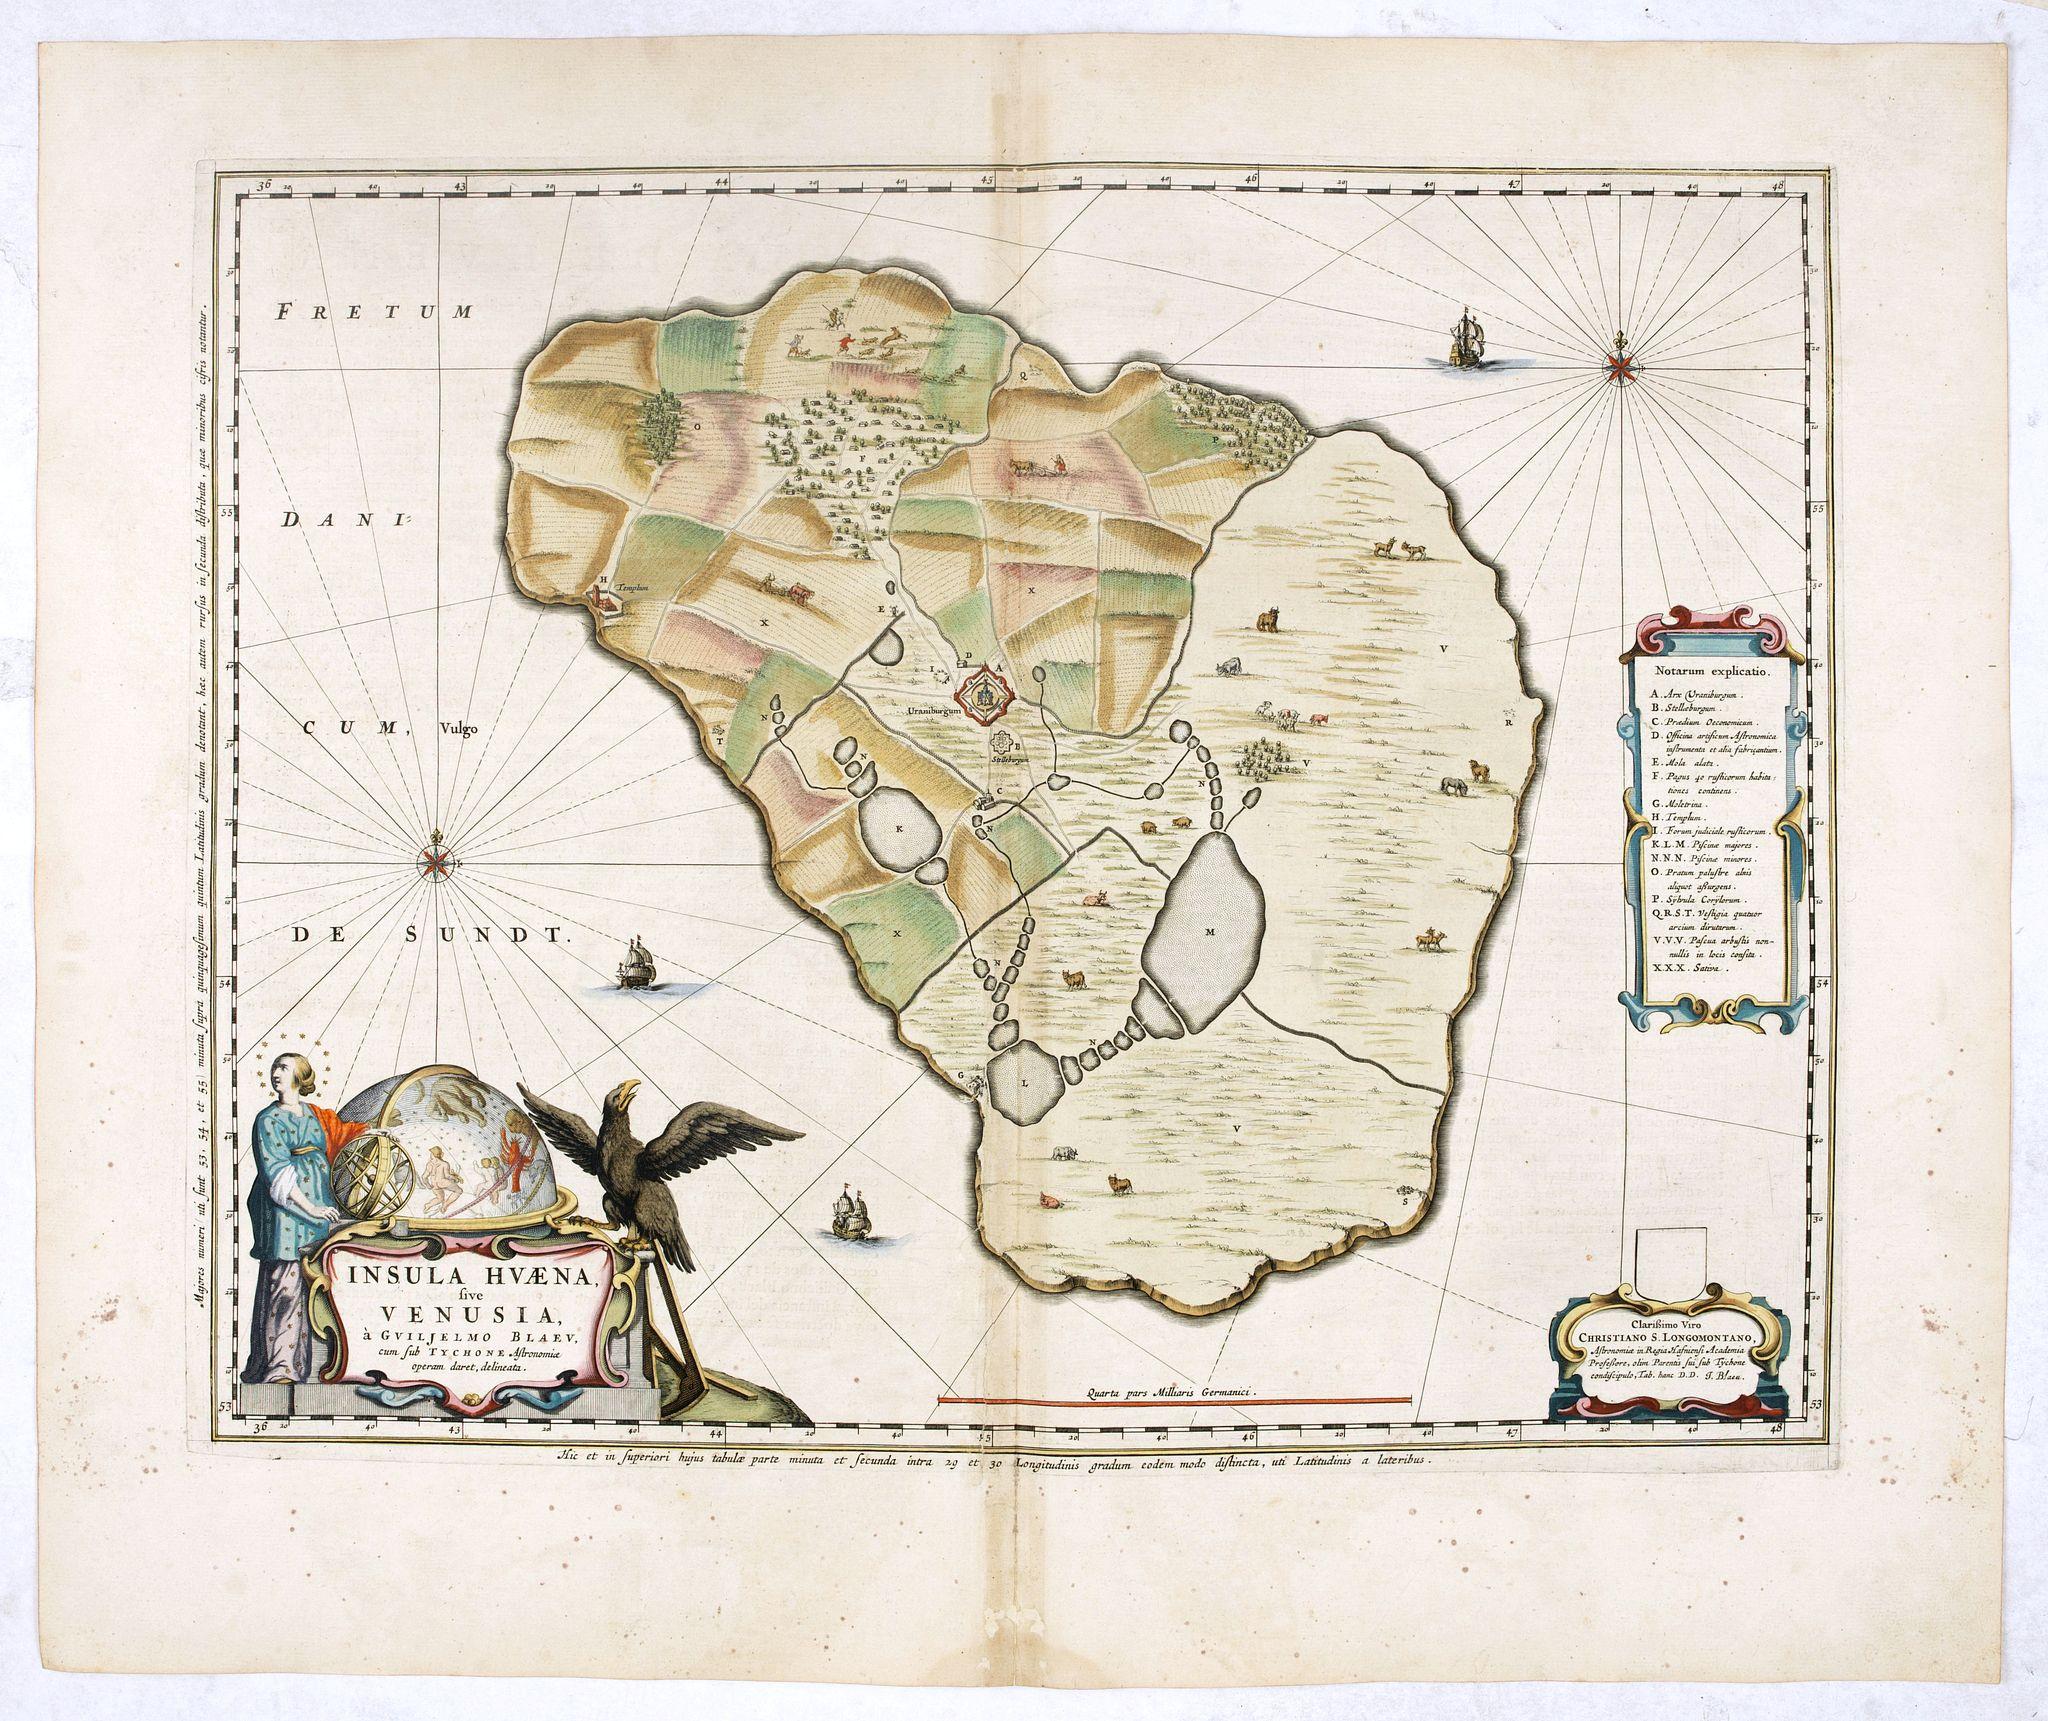 BLAEU, J. -  Insula Huaena sive Venusia a Guiljelmo Blaeu cum sub Tychone Astronomiae operam daret, delineata.